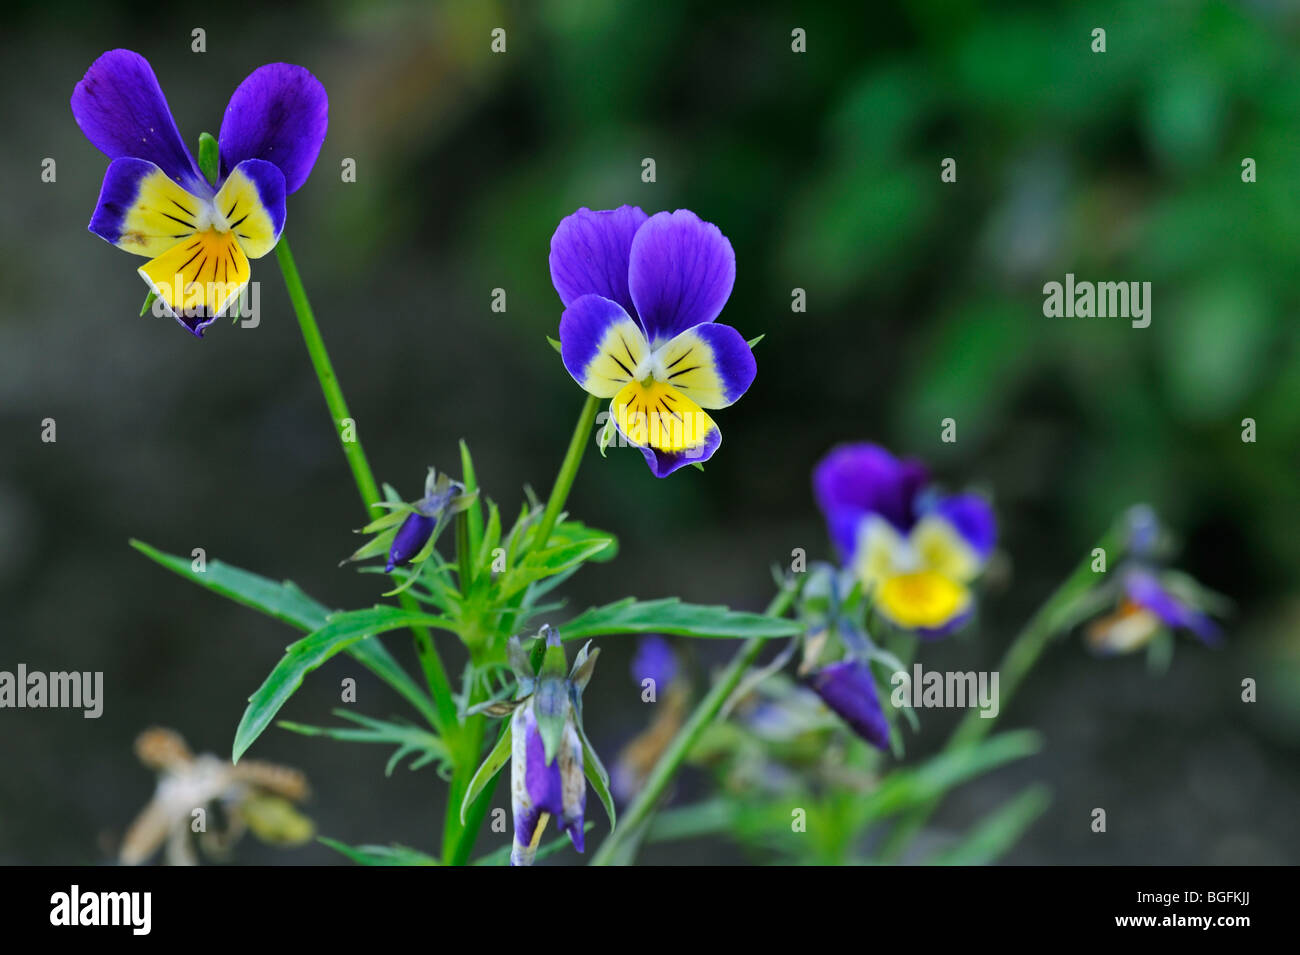 Wild pansies / heartsease / heart's ease (Viola tricolor) in flower in spring - Stock Image